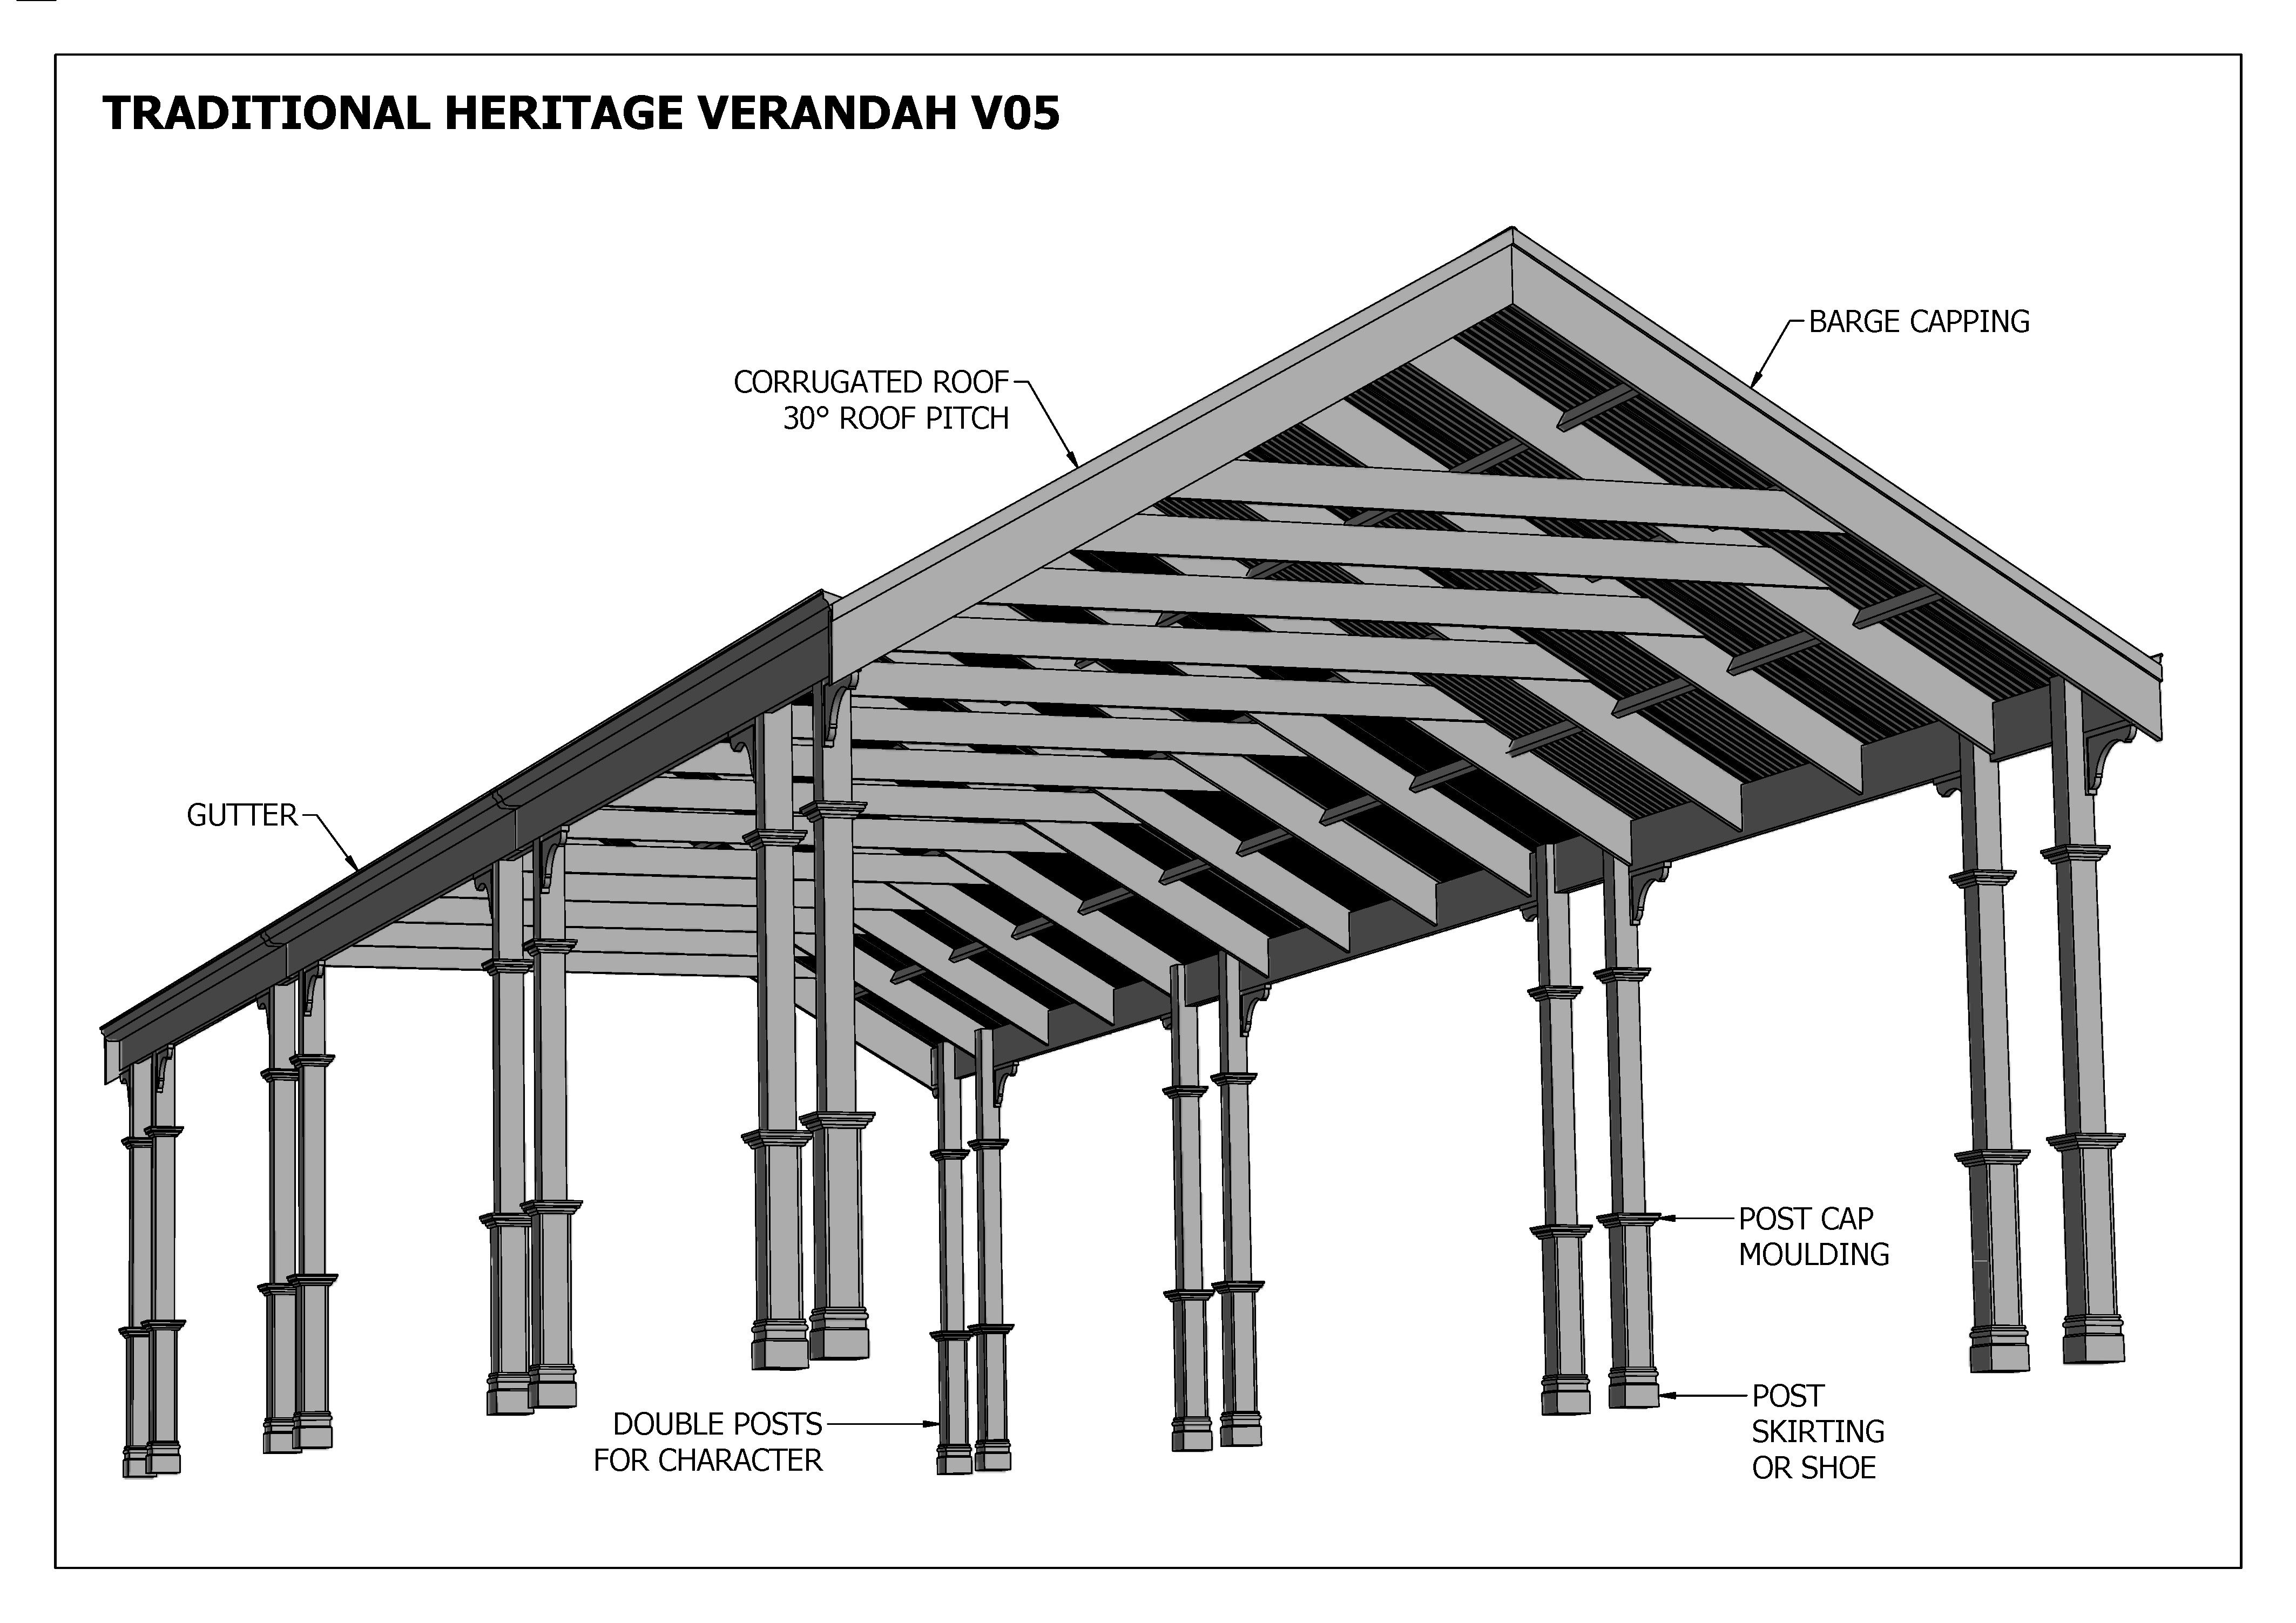 Carport And Verandah Designs Ezebuilt Veranda Carport Design